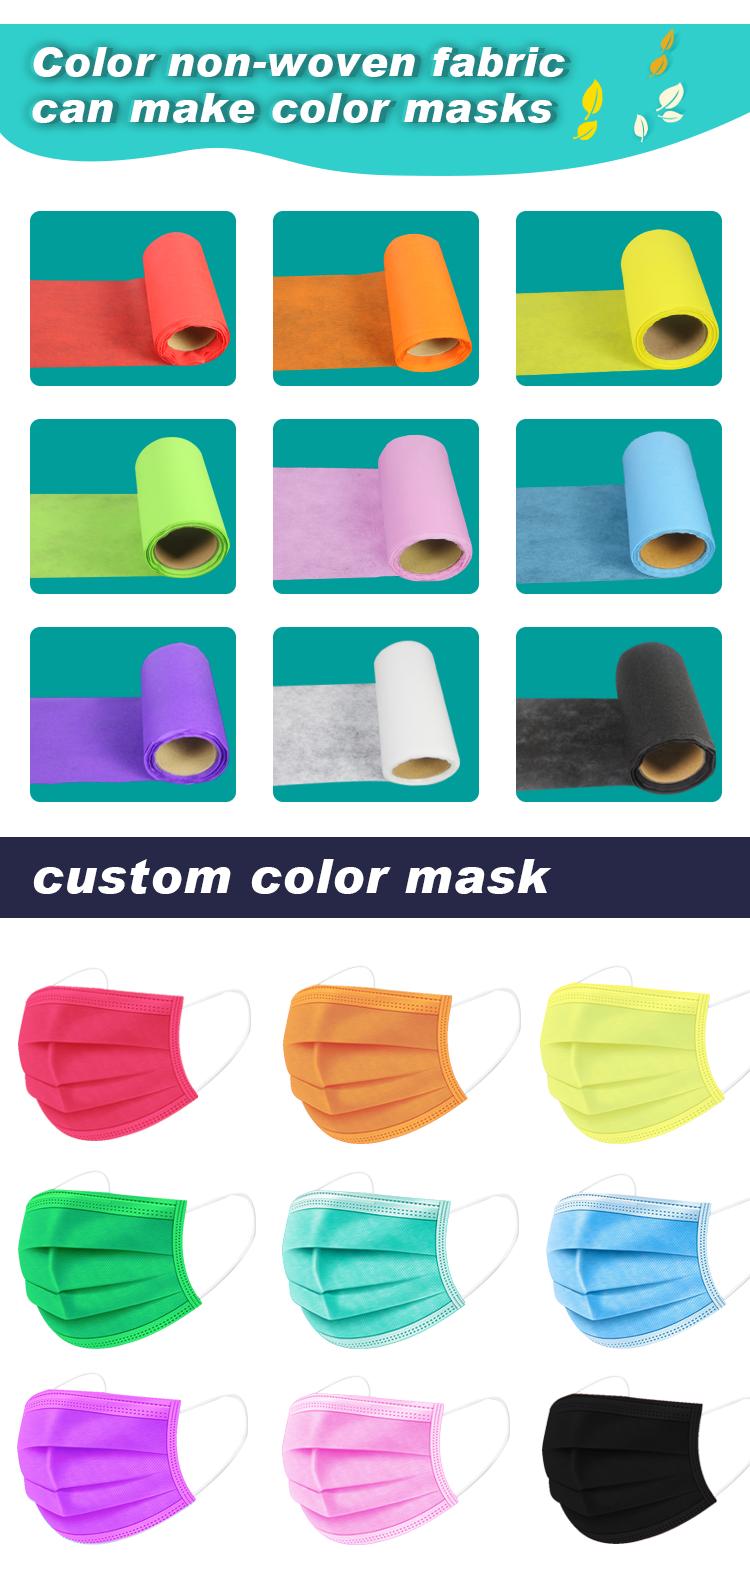 color non-wowen fabric can make color masks